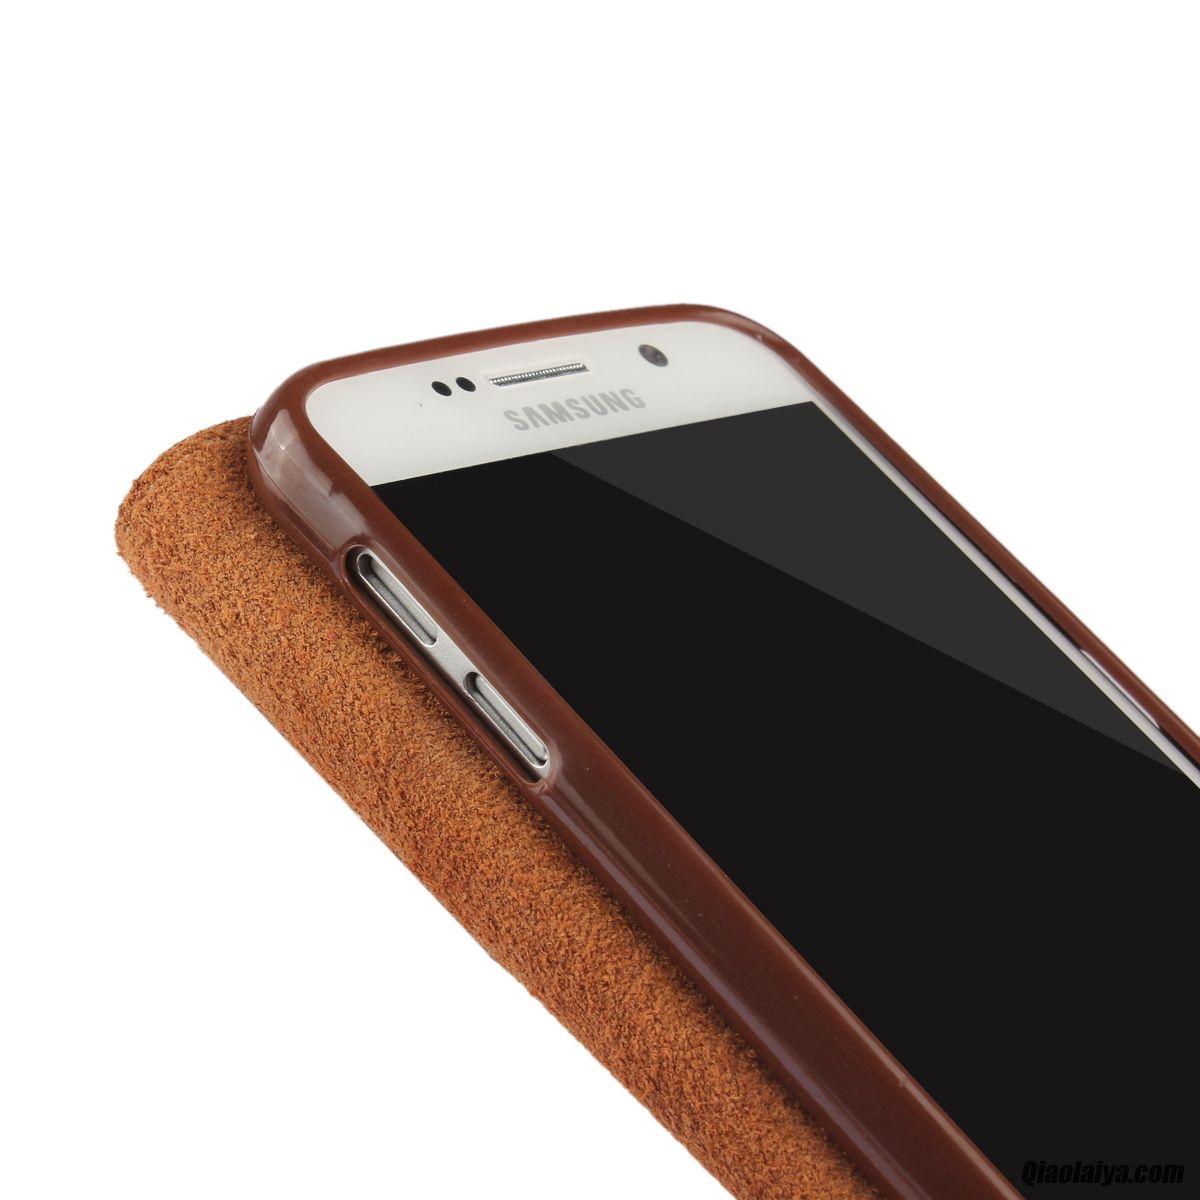 etuis telephone samsung galaxy s6 edge gu pard housse vente de t l phone portable lawngreen. Black Bedroom Furniture Sets. Home Design Ideas